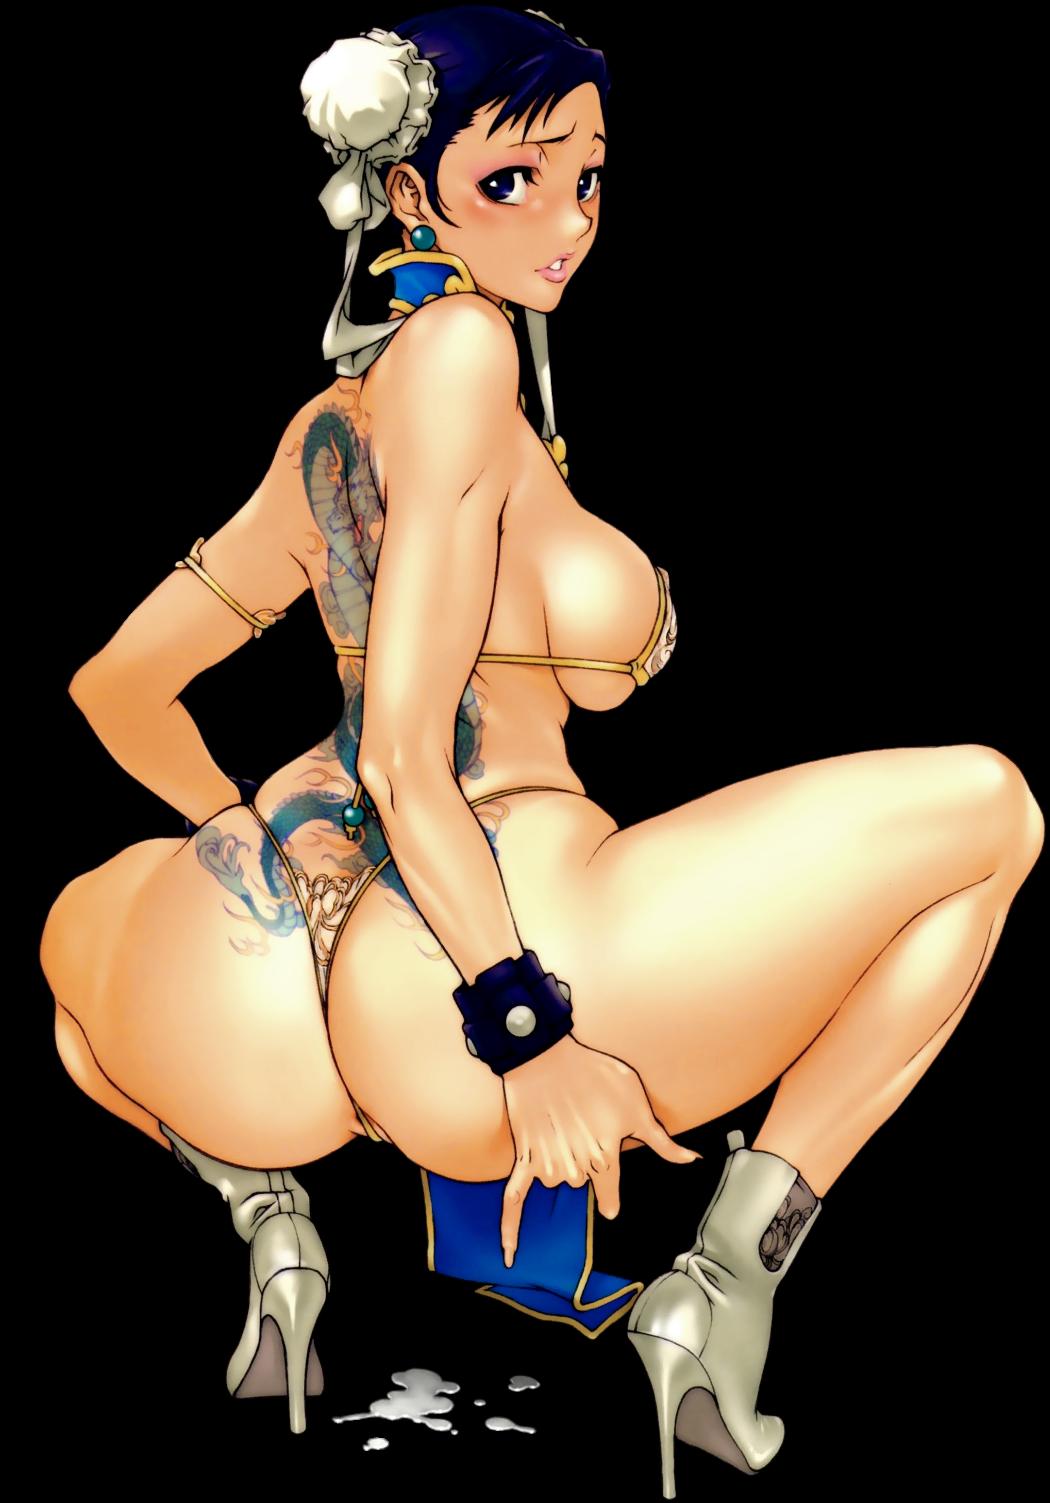 Chun li mirada sexy